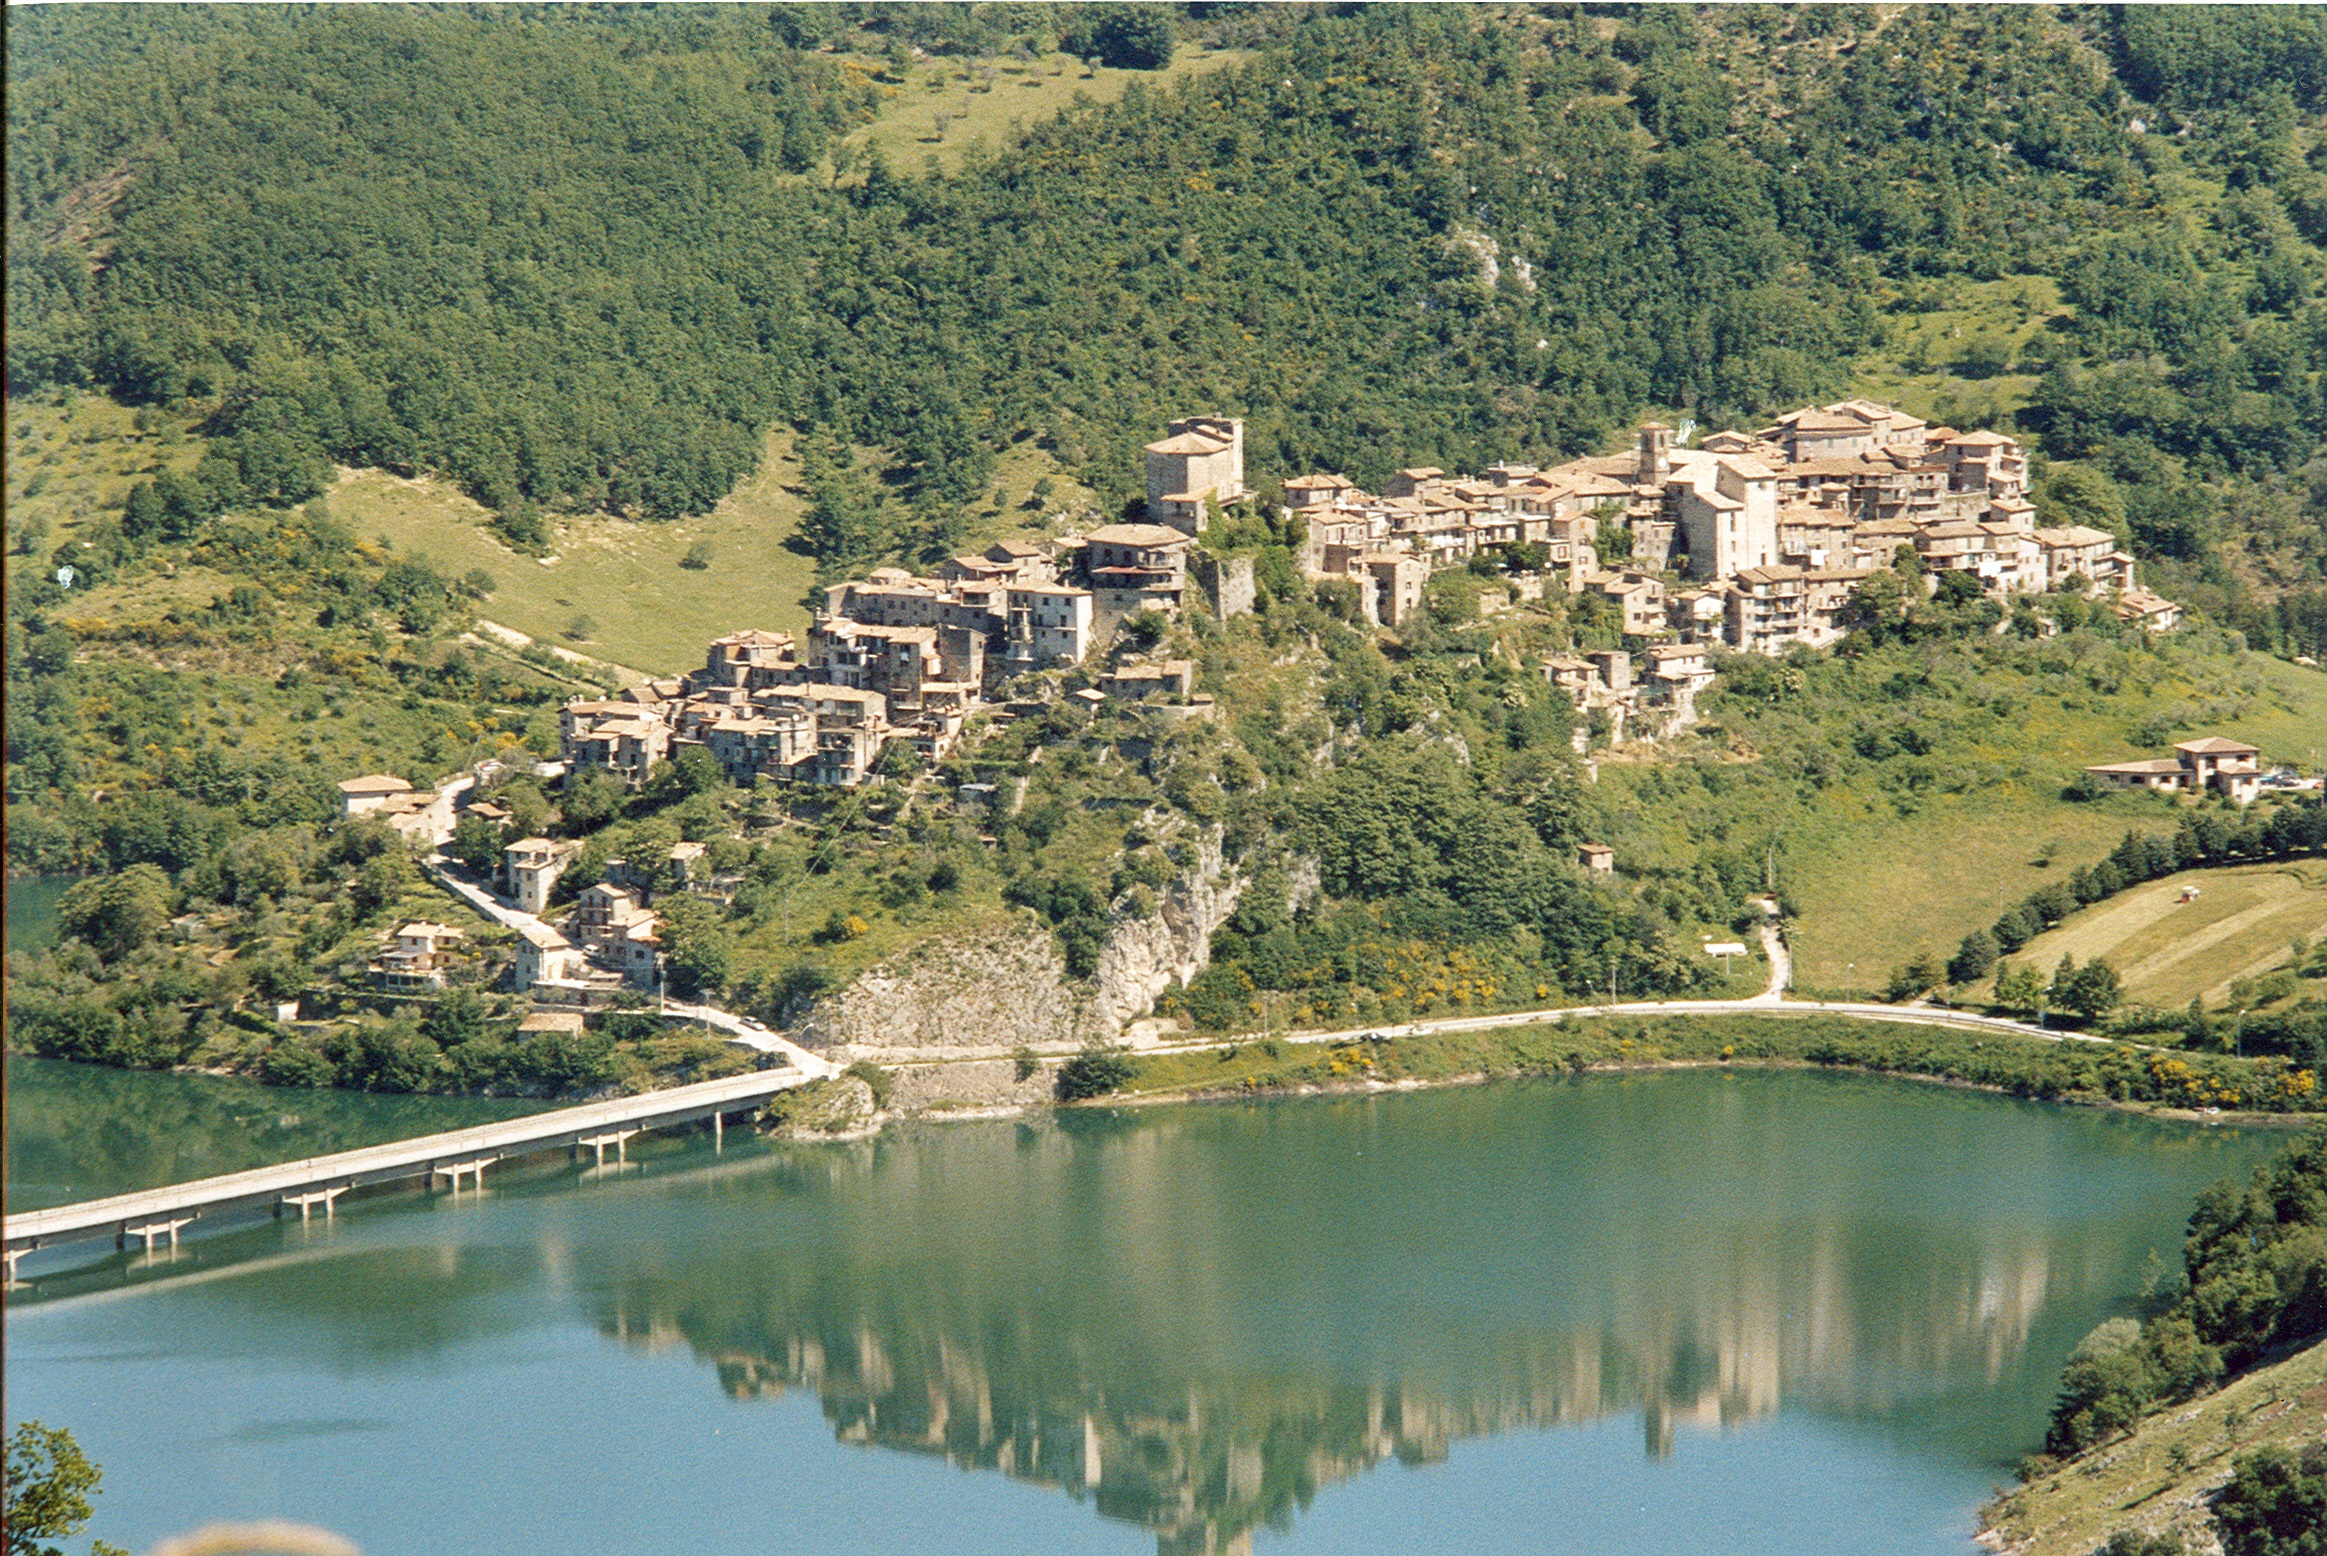 2013-08-14-Castelditora1.jpg